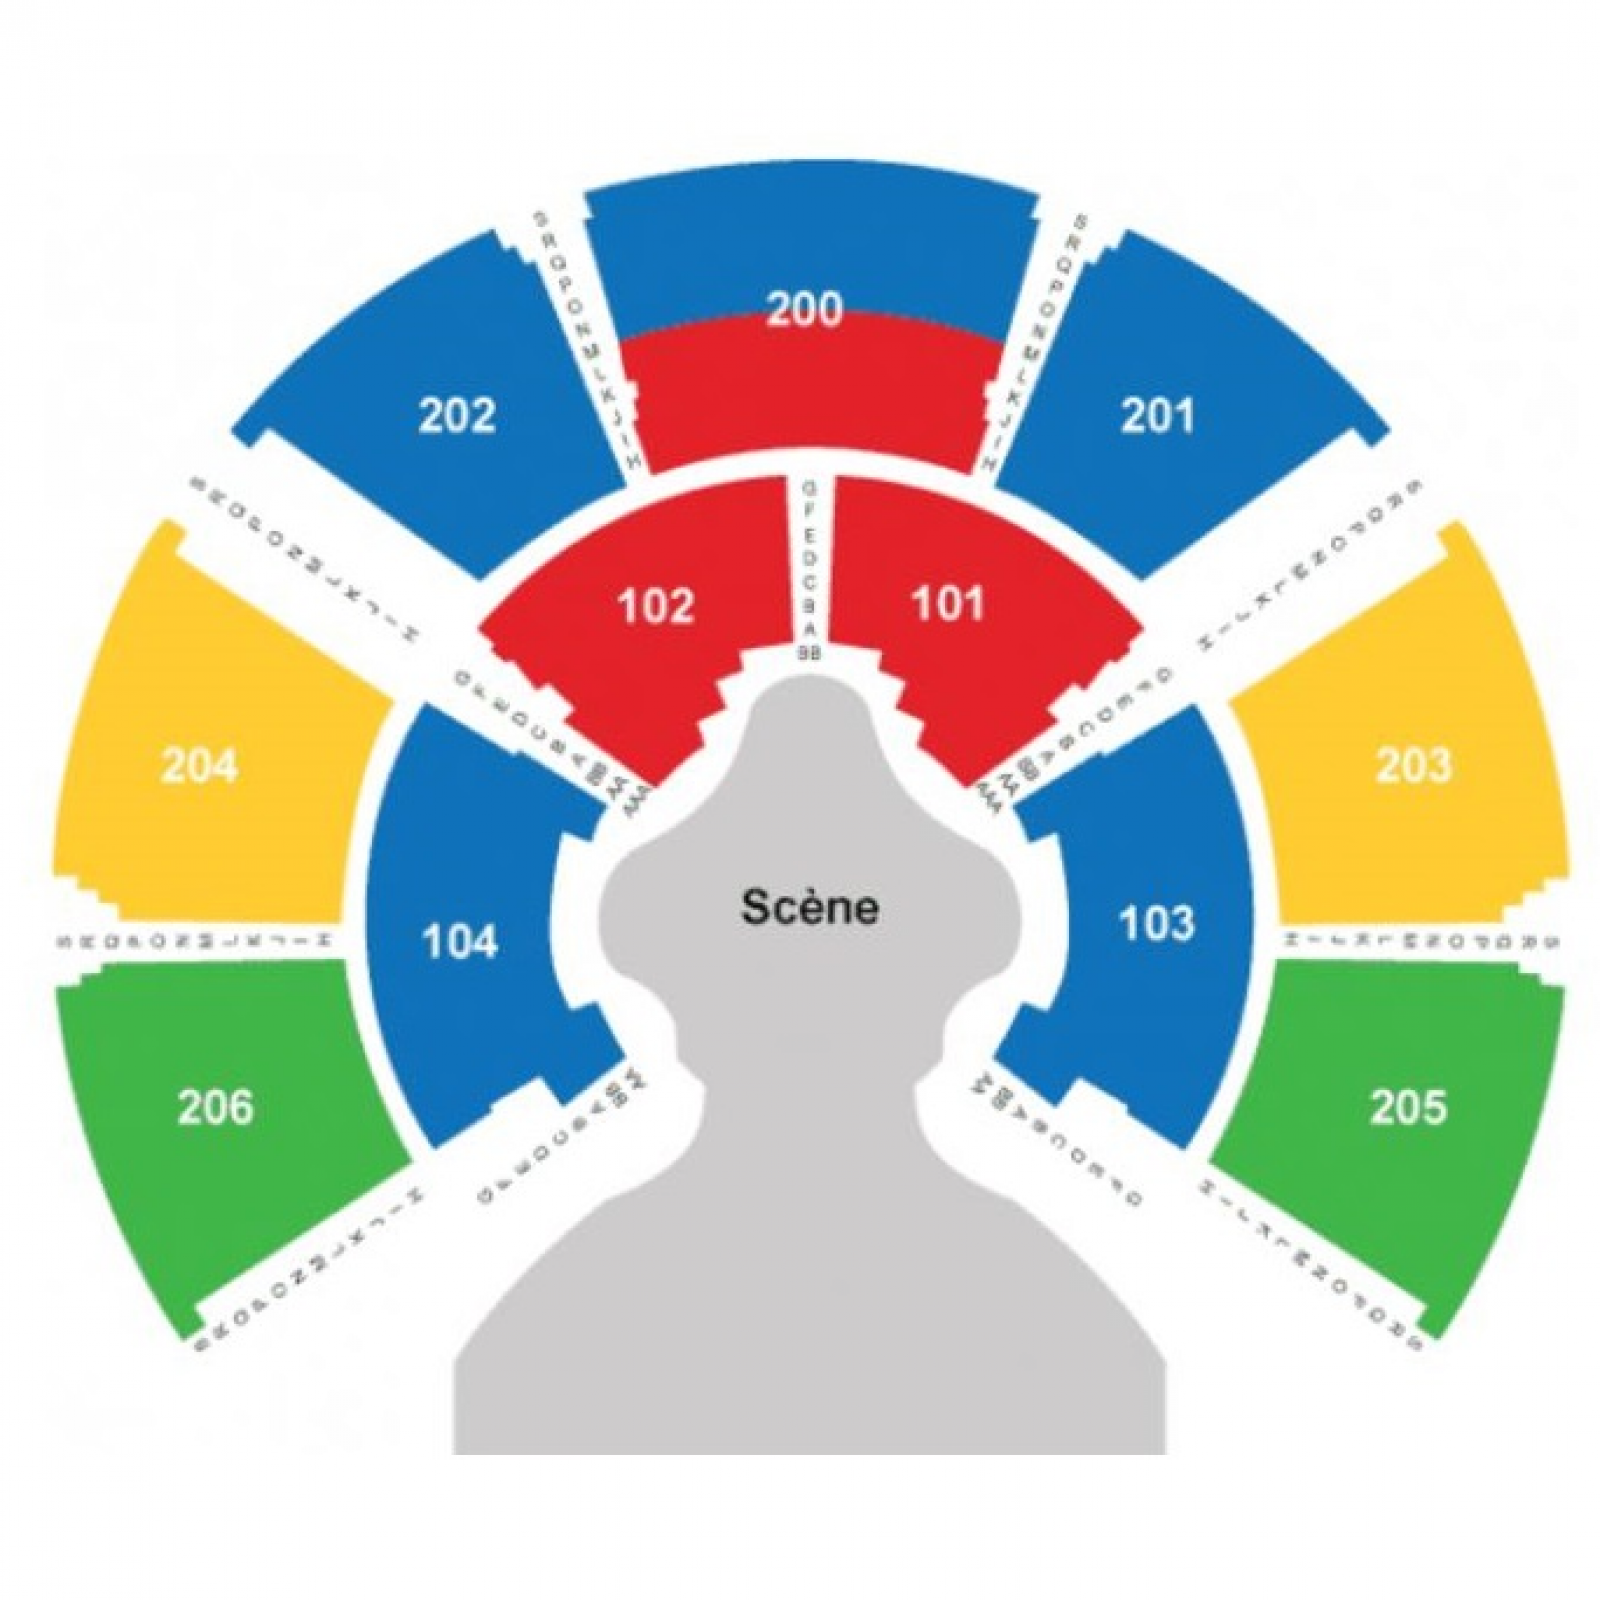 Third Row Seating >> Cirque Du Soleil - VOLTA Tickets - Cirque Du Soleil - VOLTA Montreal Tickets - Grand Chapiteau ...